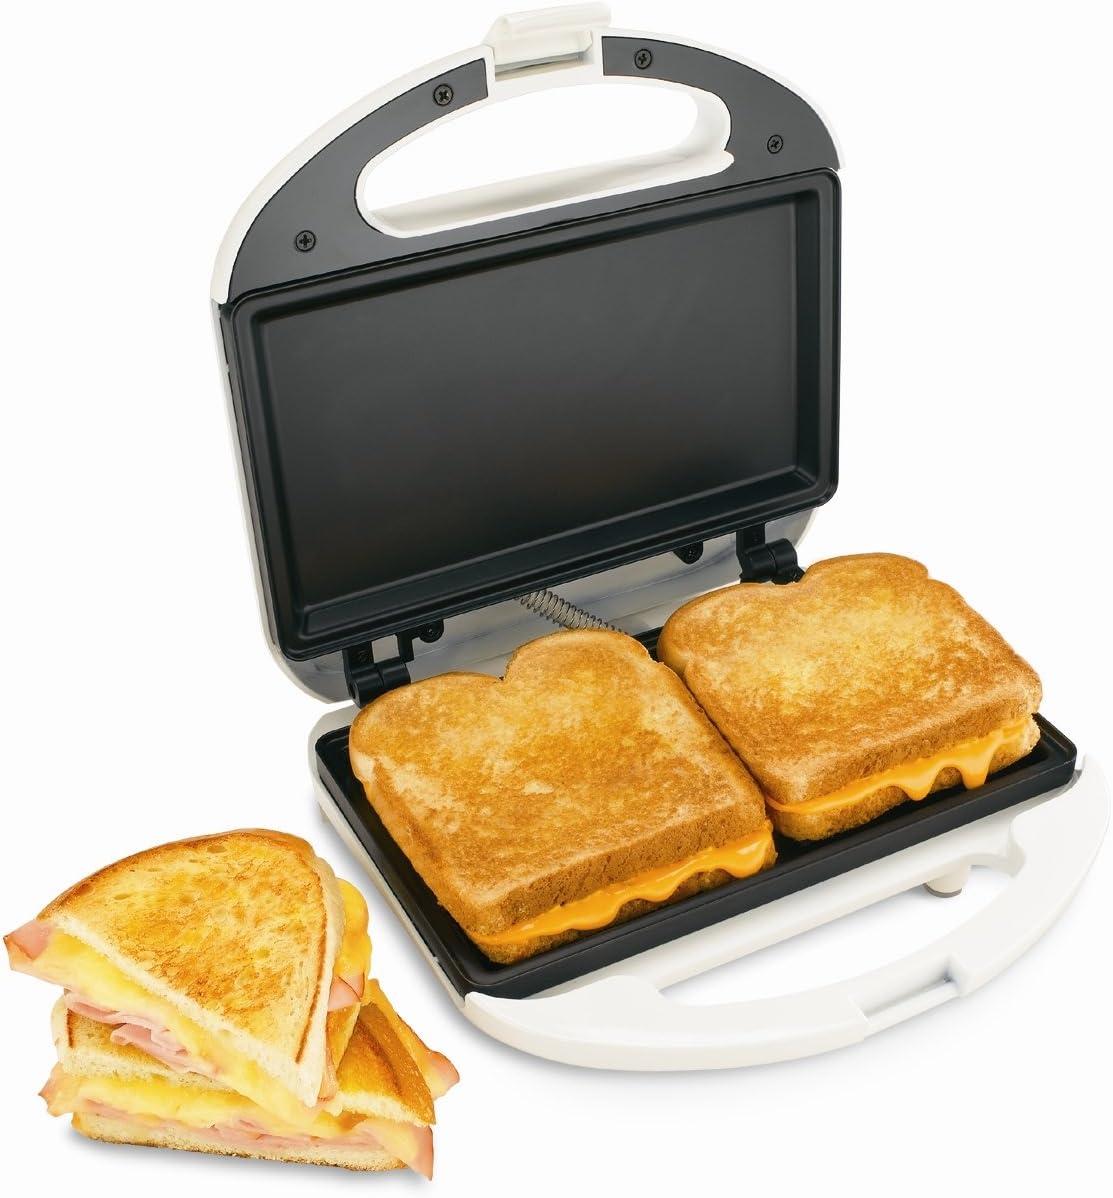 Amazon Com Proctor Silex Sandwich Maker White Electric Sandwich Makers Kitchen Dining